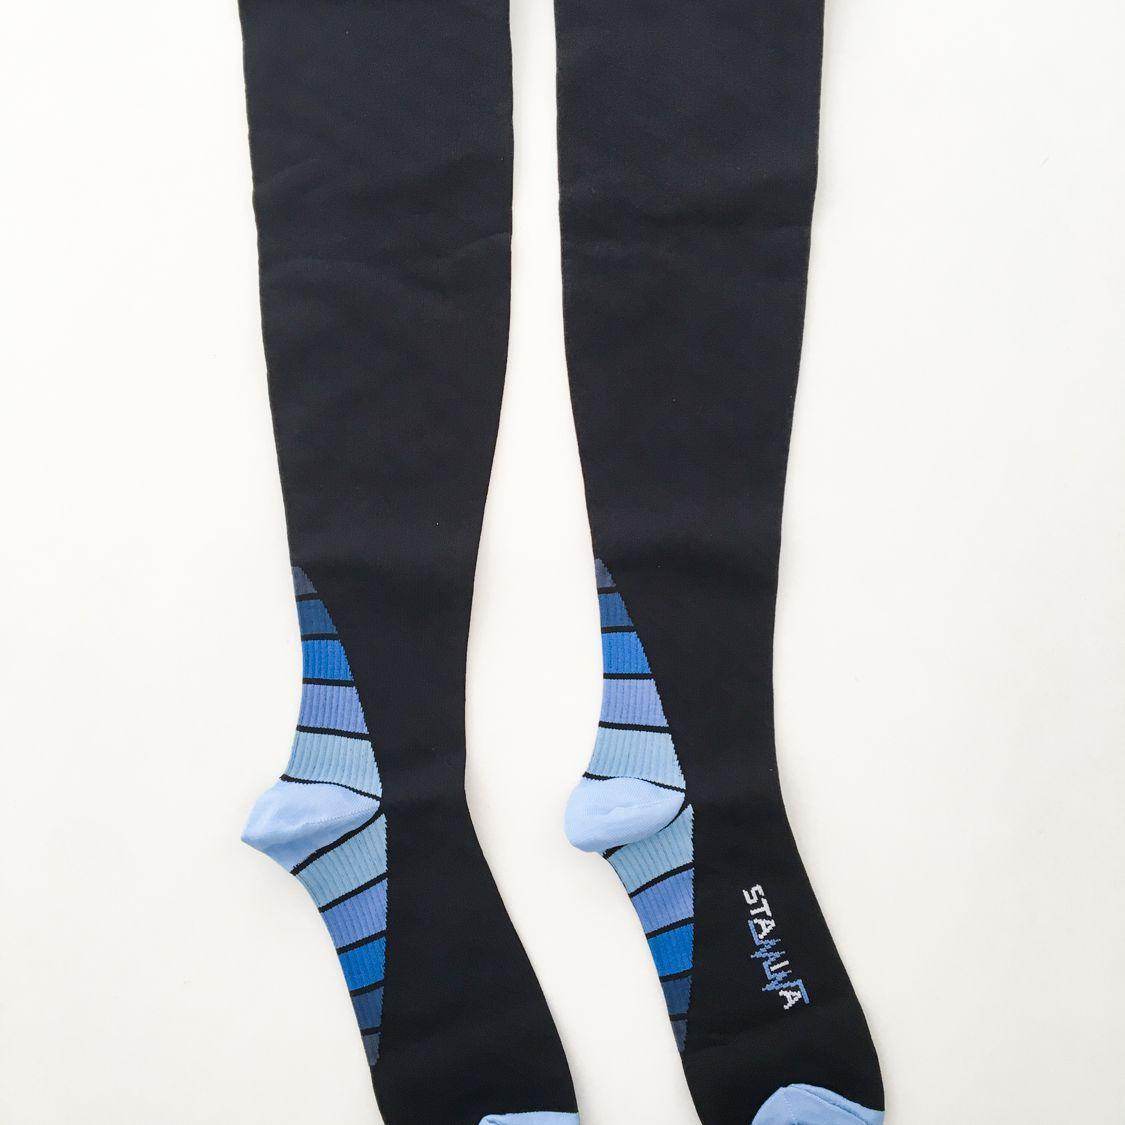 0b3f3dd1f1a48c Physix Gear Sport Compression Socks. Physix Gear Socks for Men and Women